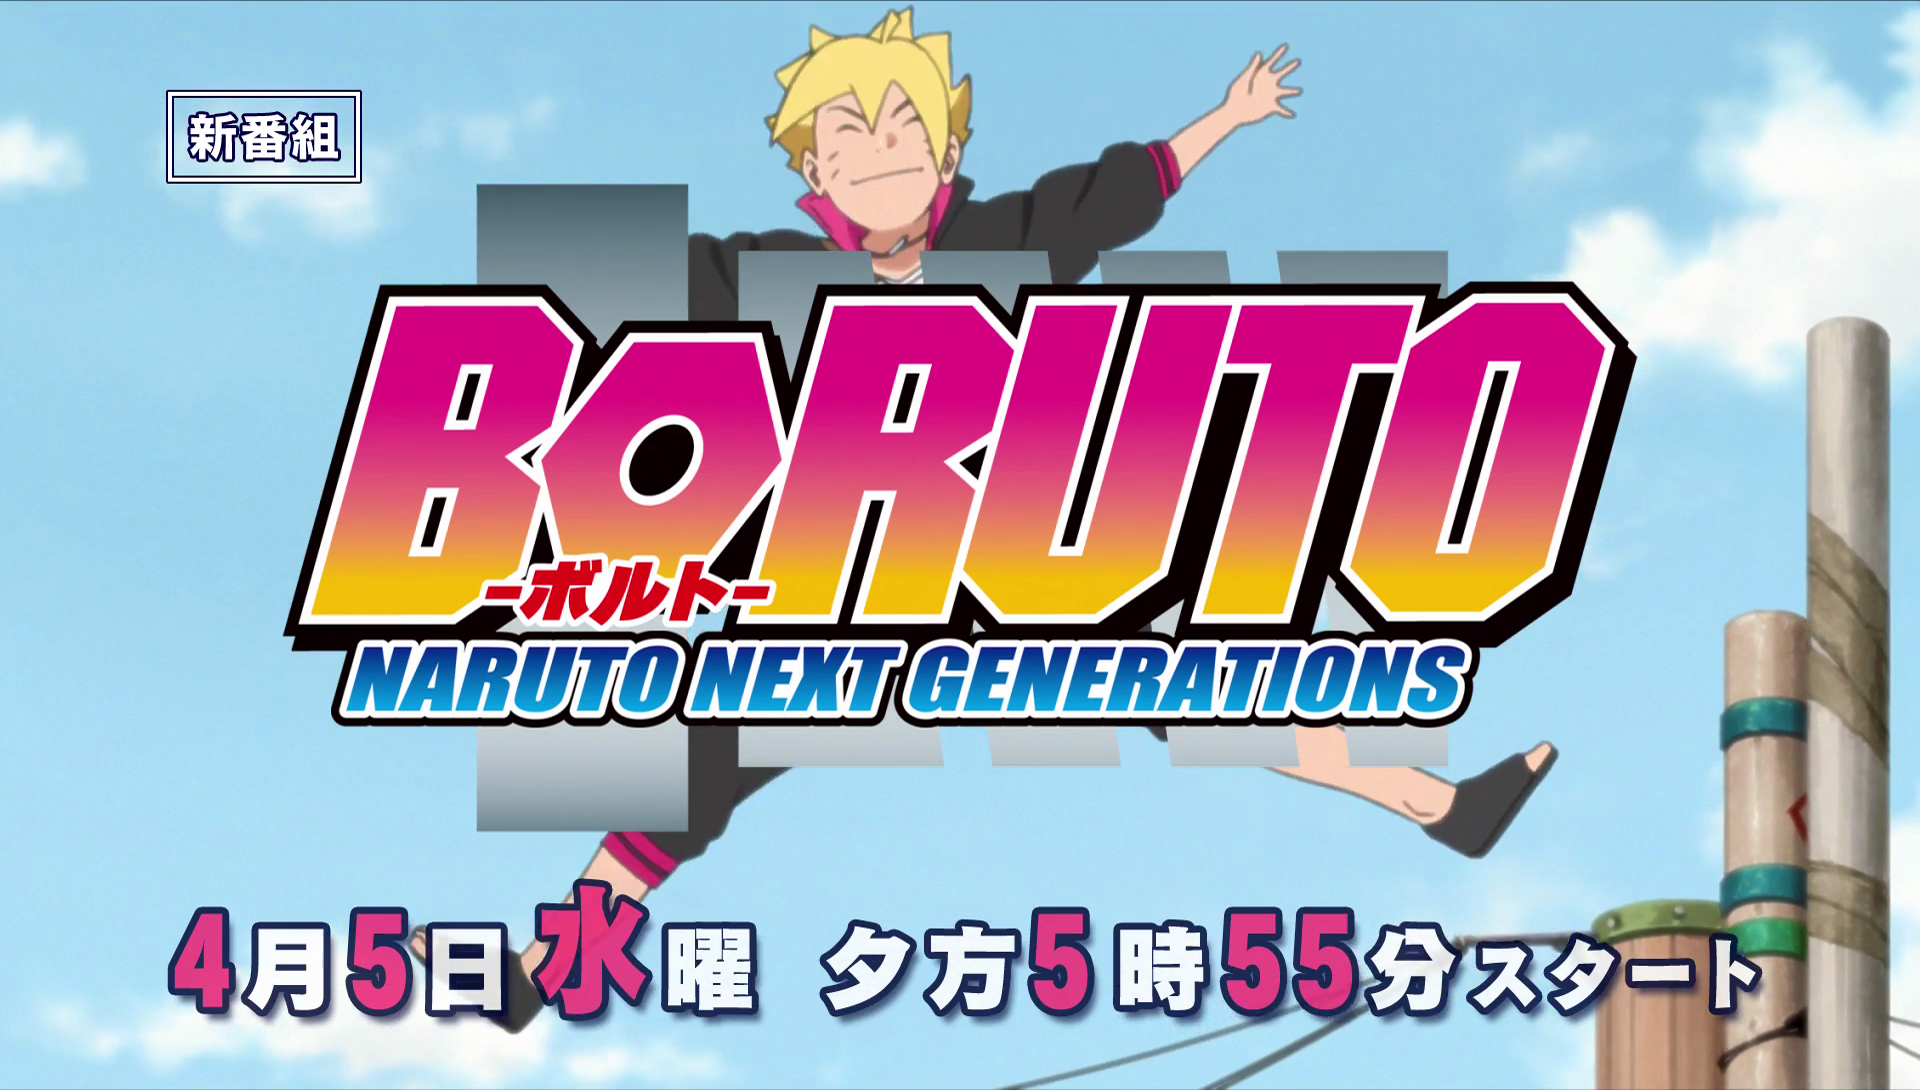 Boruto -Naruto Next Generations PV 2 - 14 by AiKawaiiChan